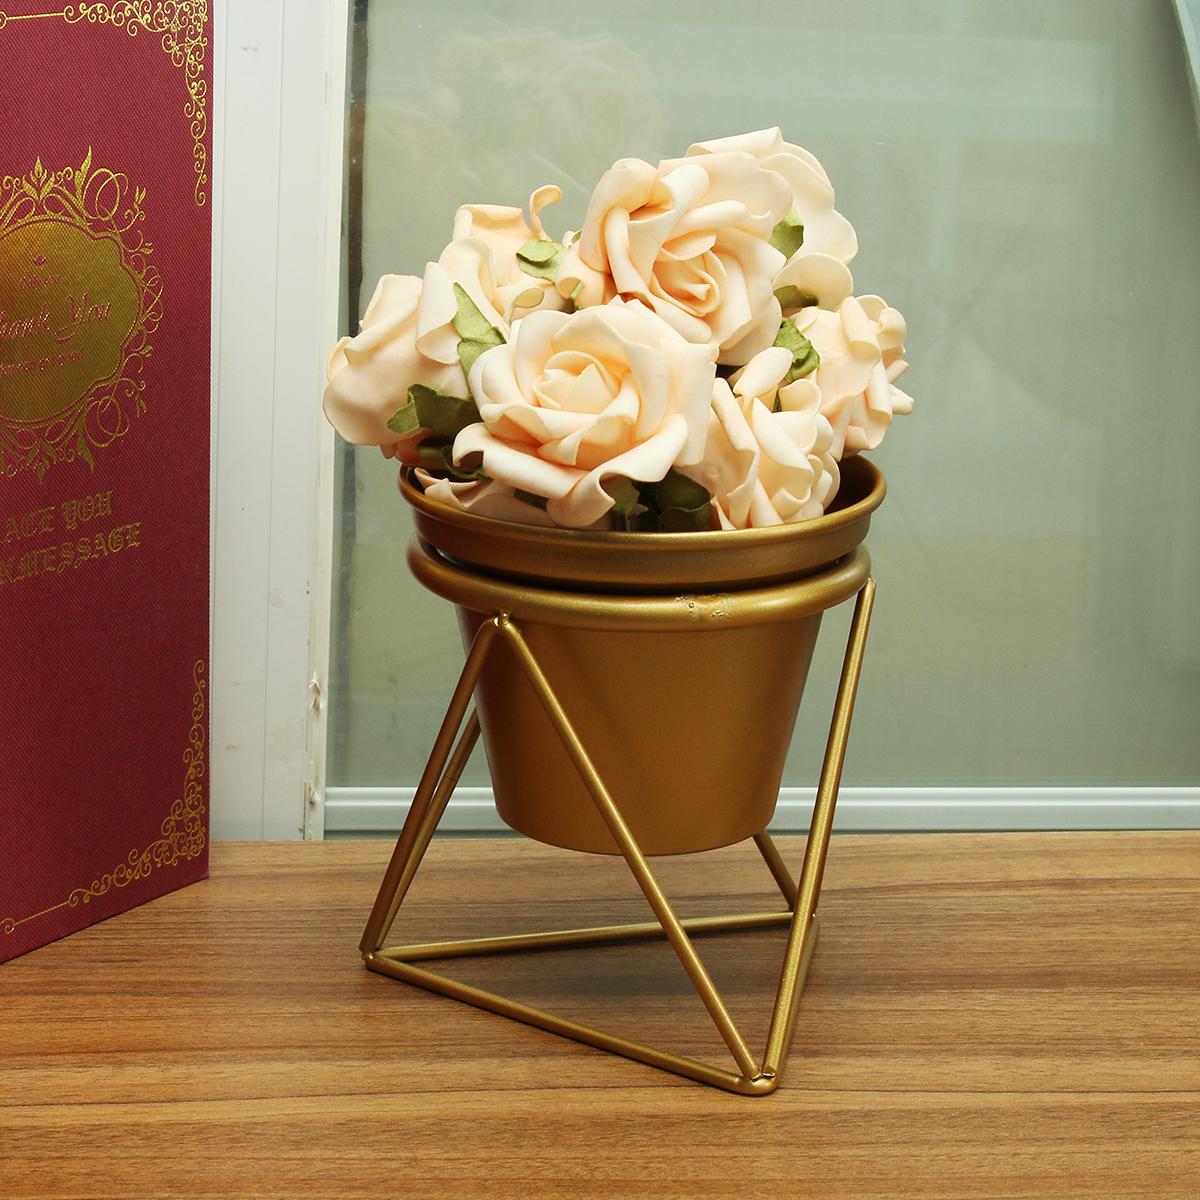 Home Garden Golden Flower Pot Plants Display Stand Planter Desk Rack Shelves Organizer